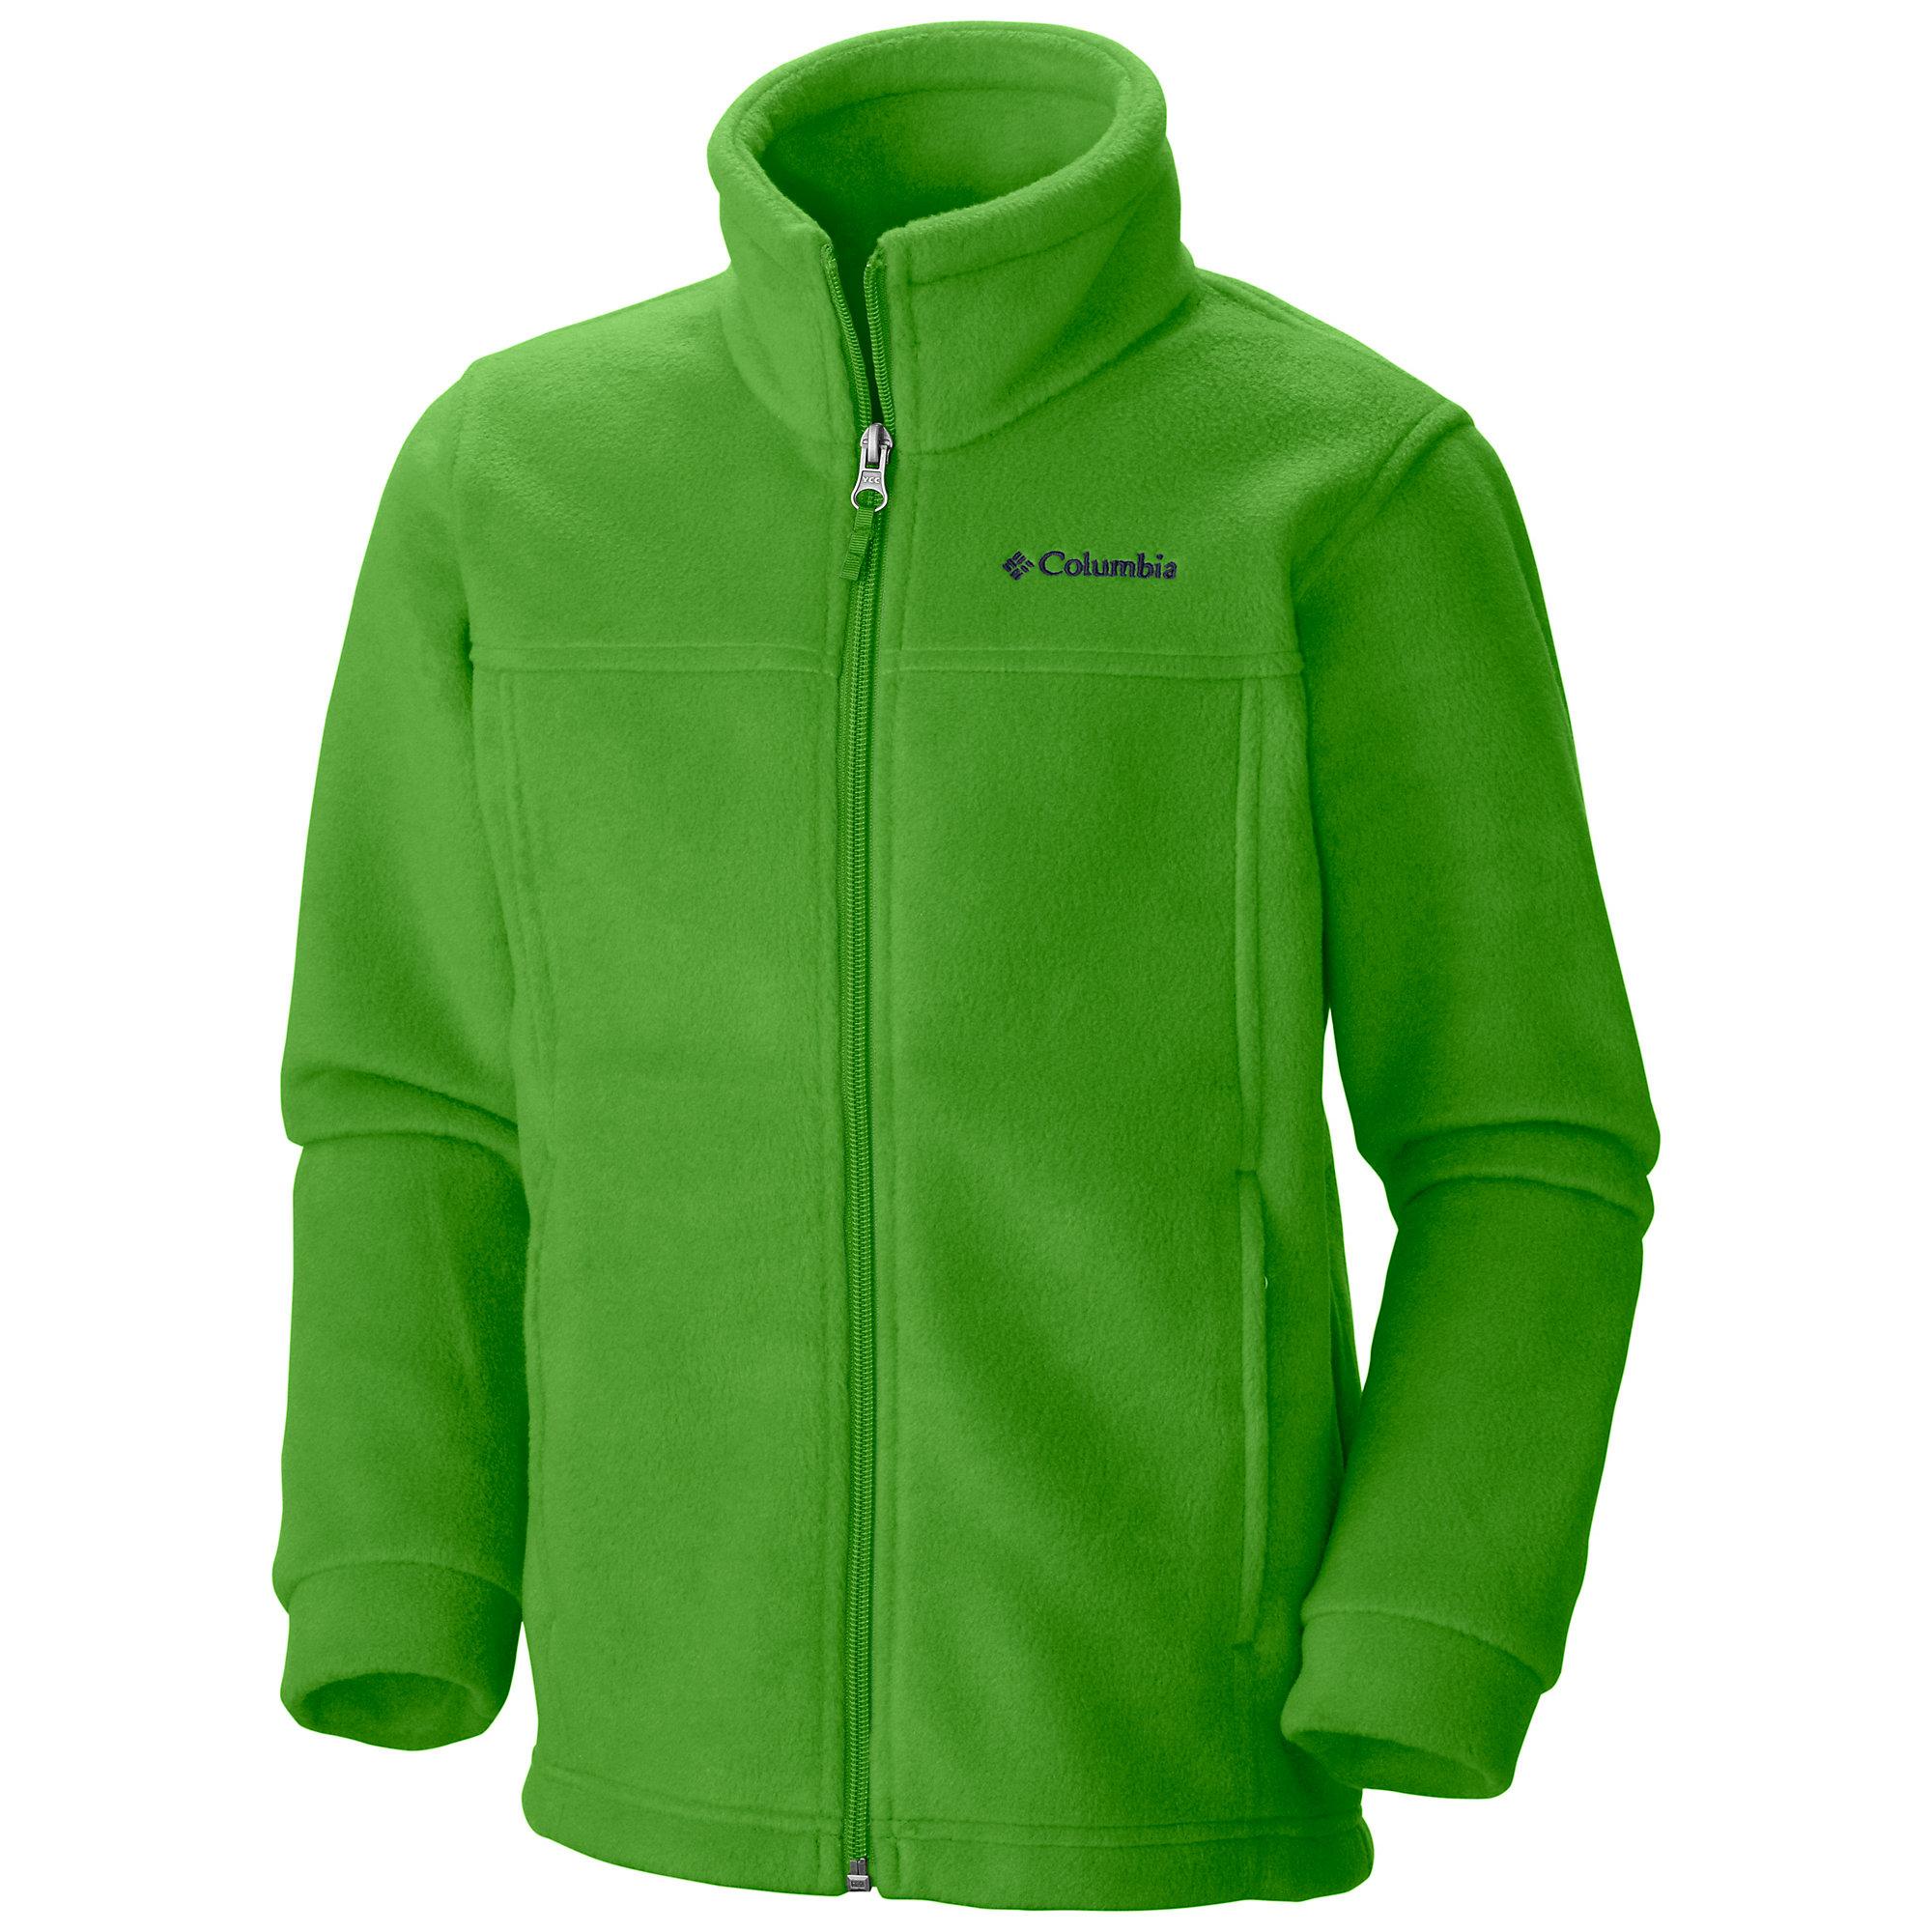 e8f77cc70 UPC 887253915820 product image for Columbia Steens Mt II Fleece L- Green |  upcitemdb.